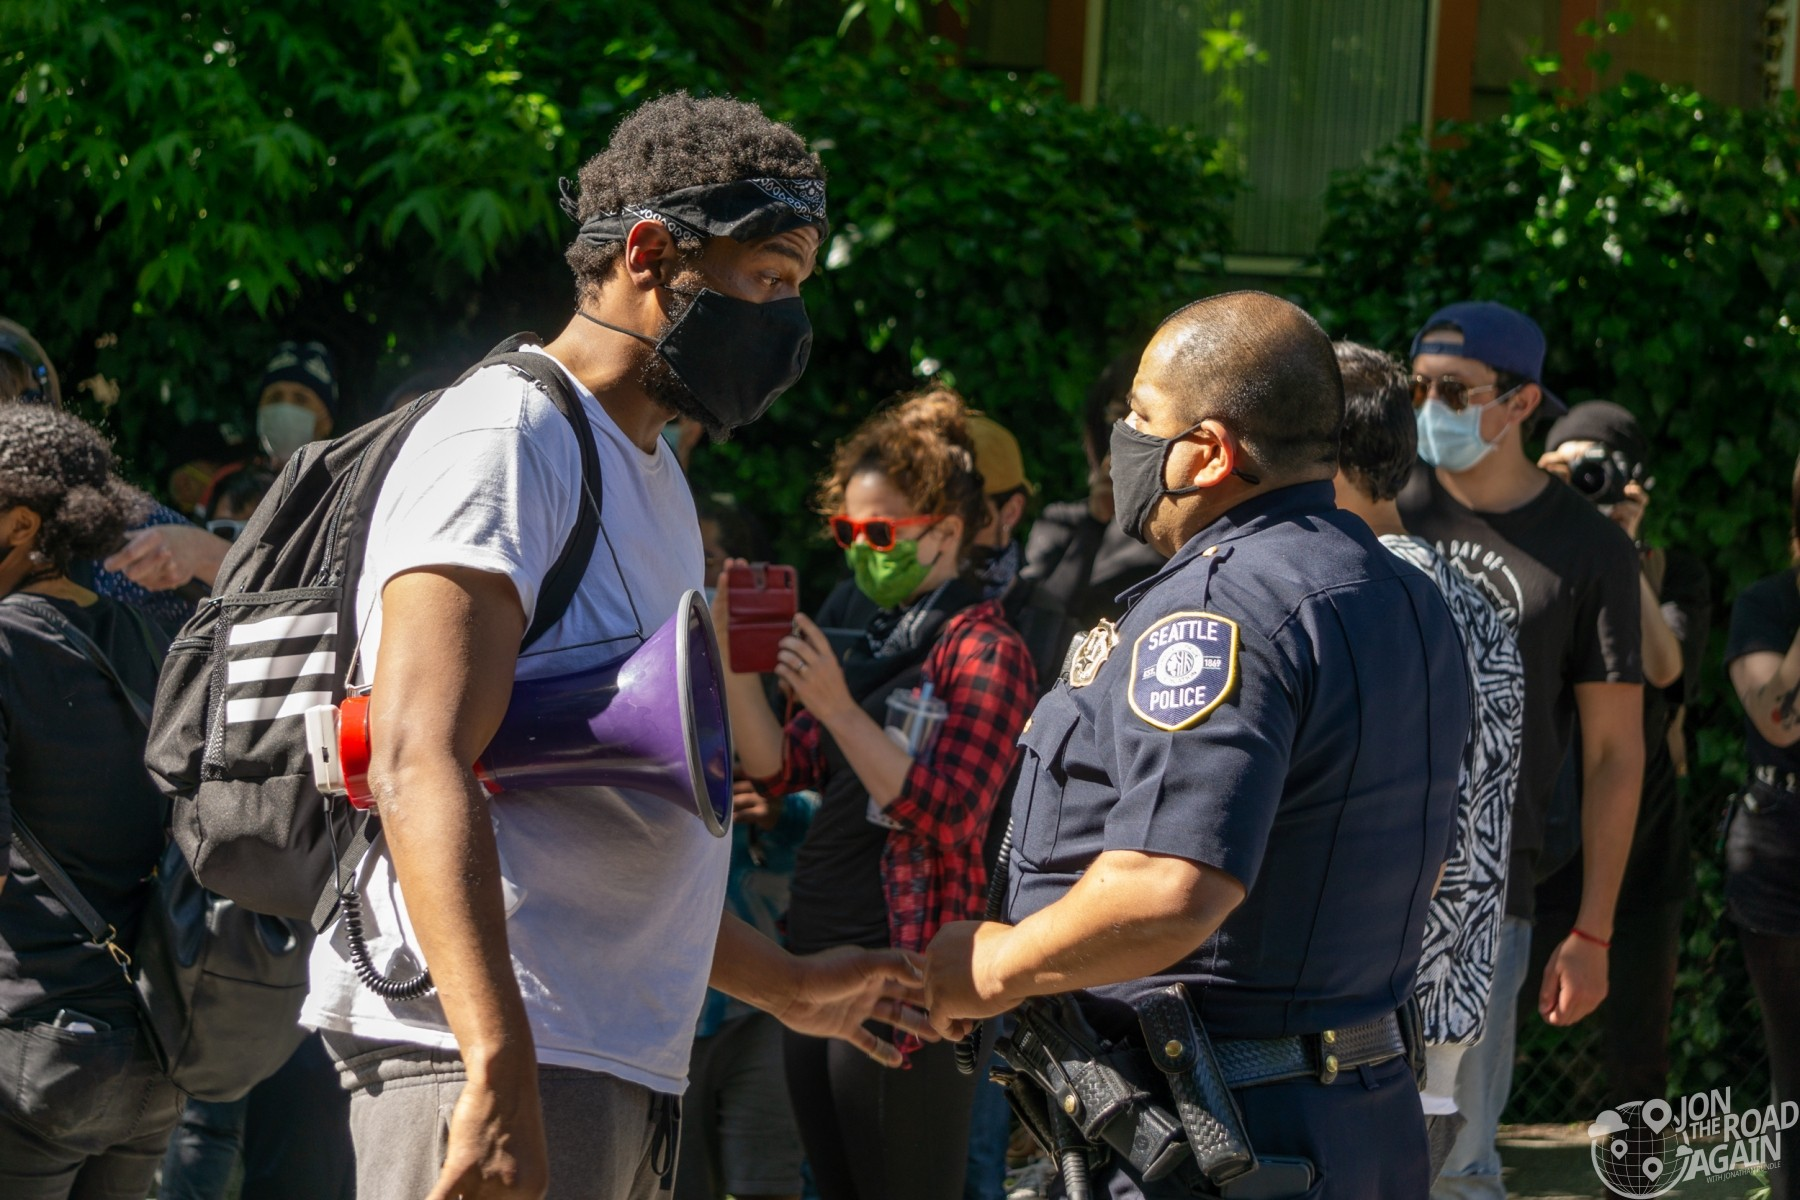 Police visit CHAZ